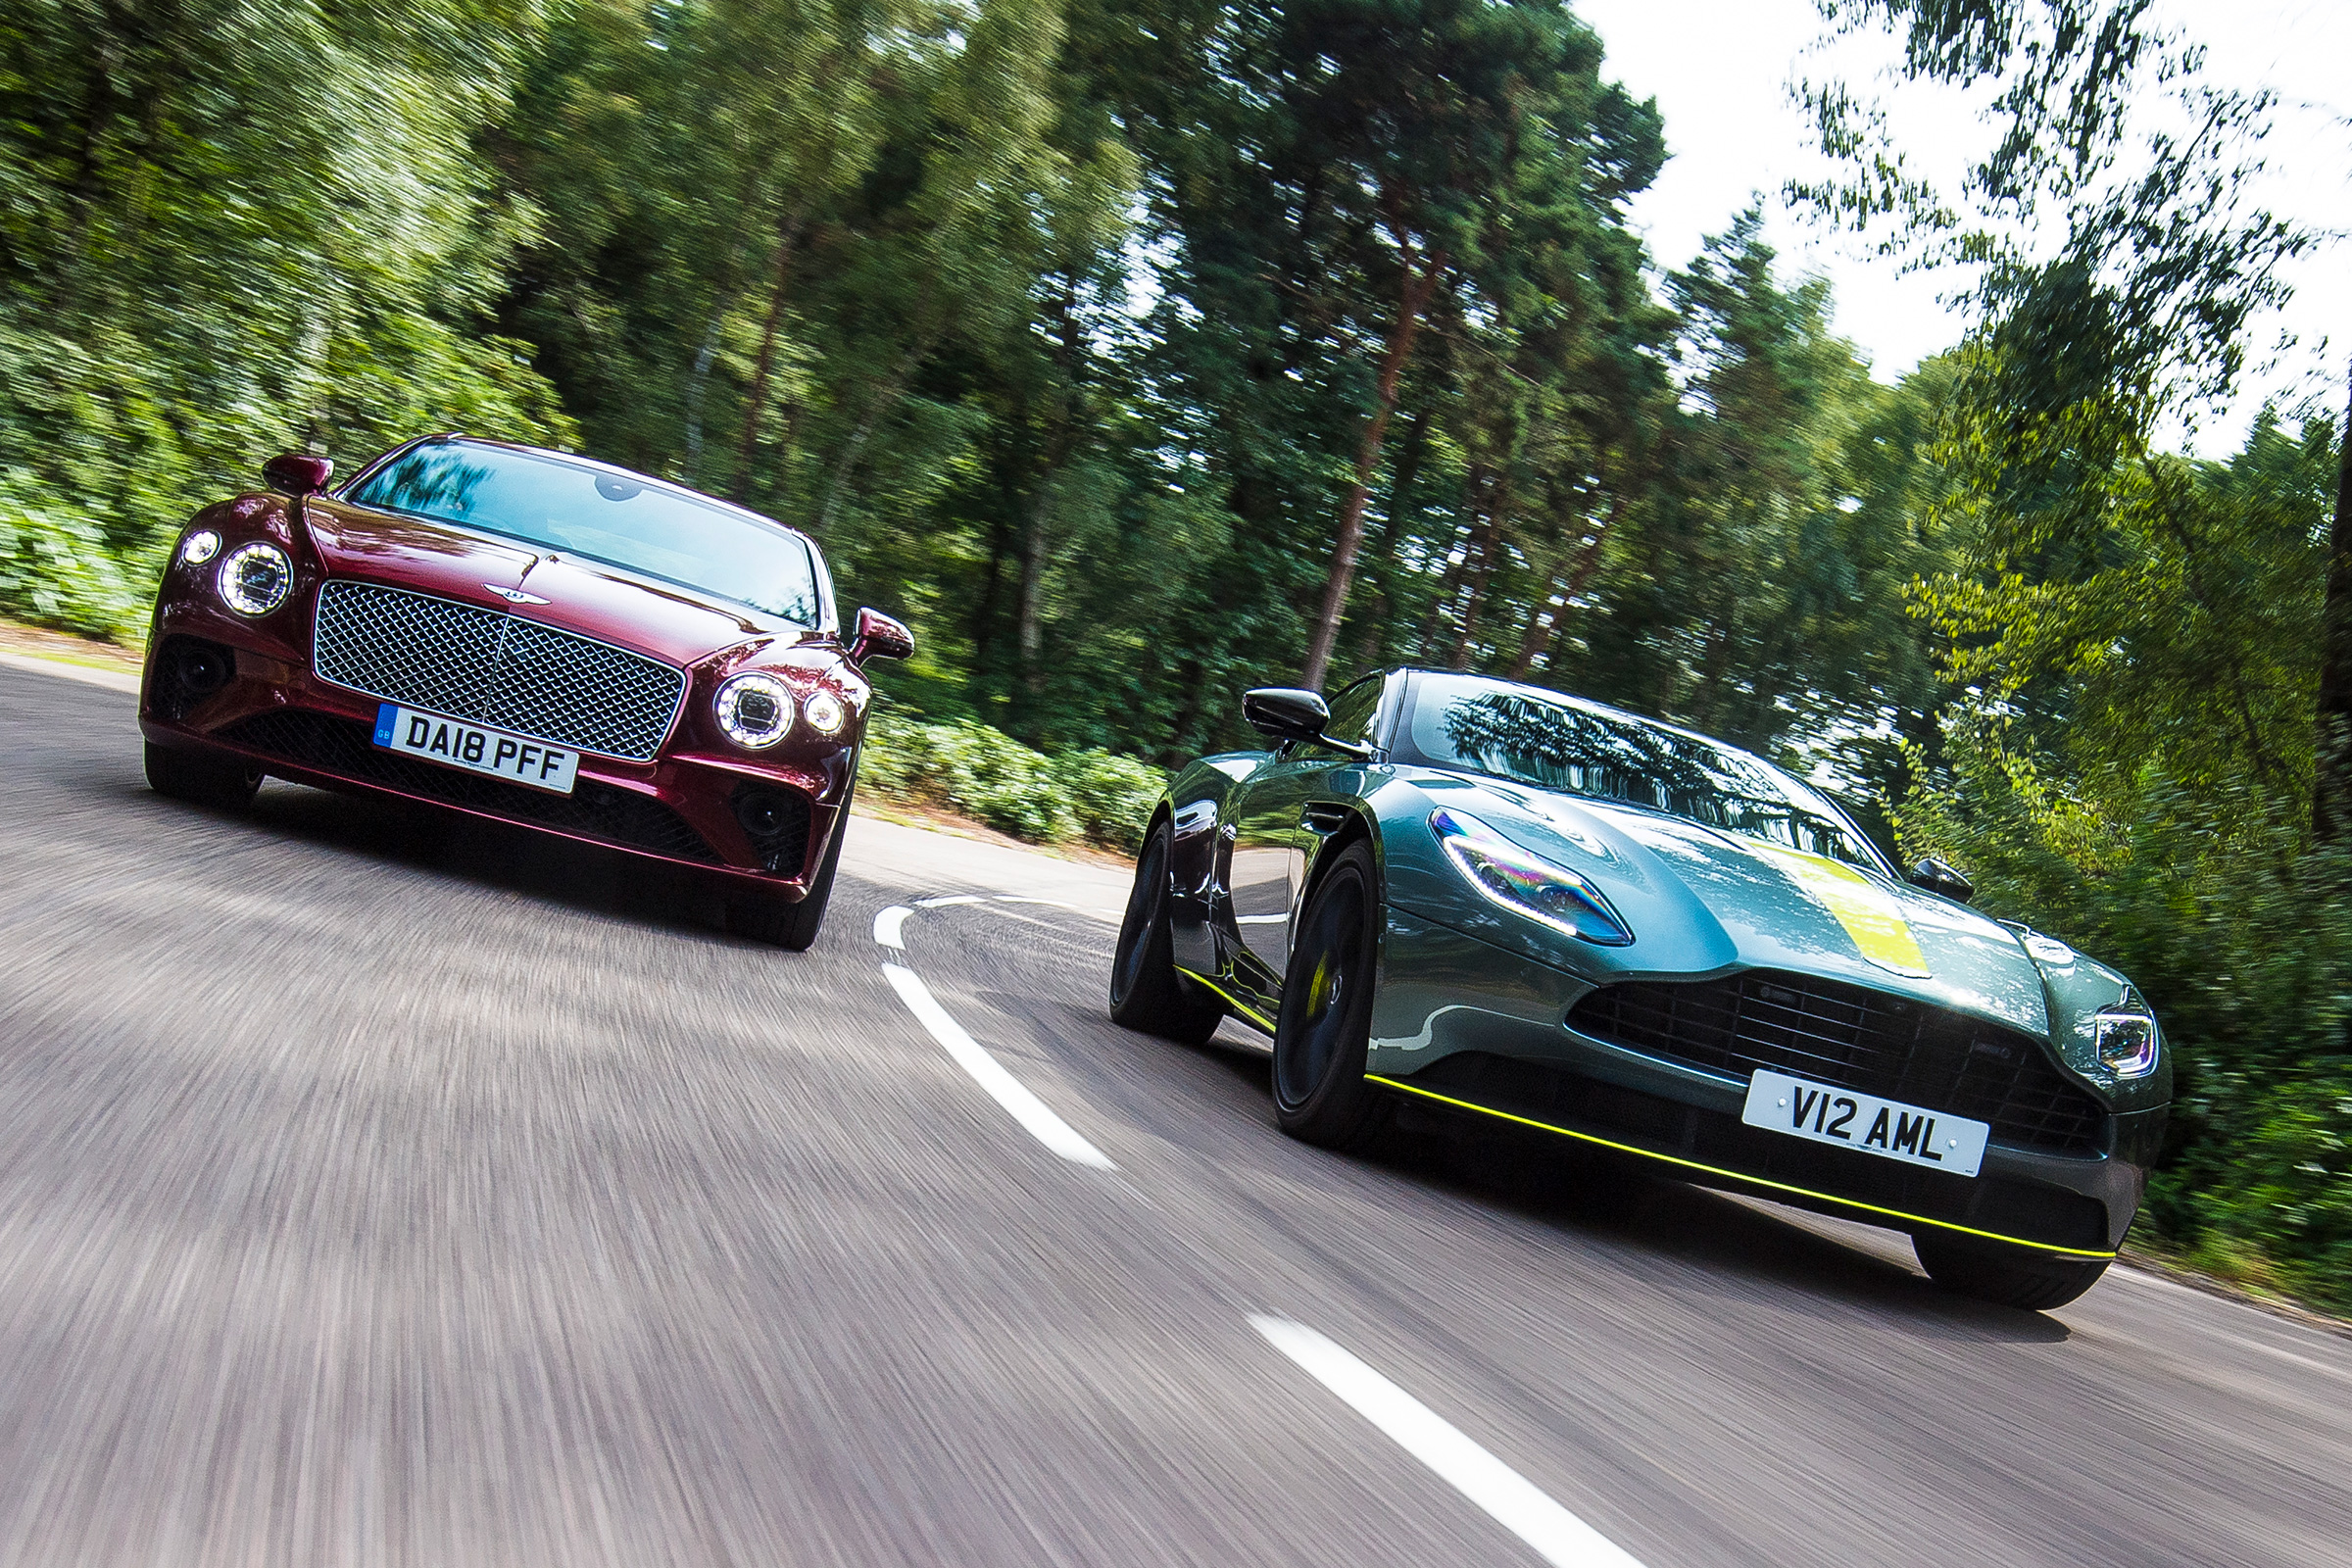 Aston Martin Db11 Amr Vs Bentley Continental Gt Auto Express